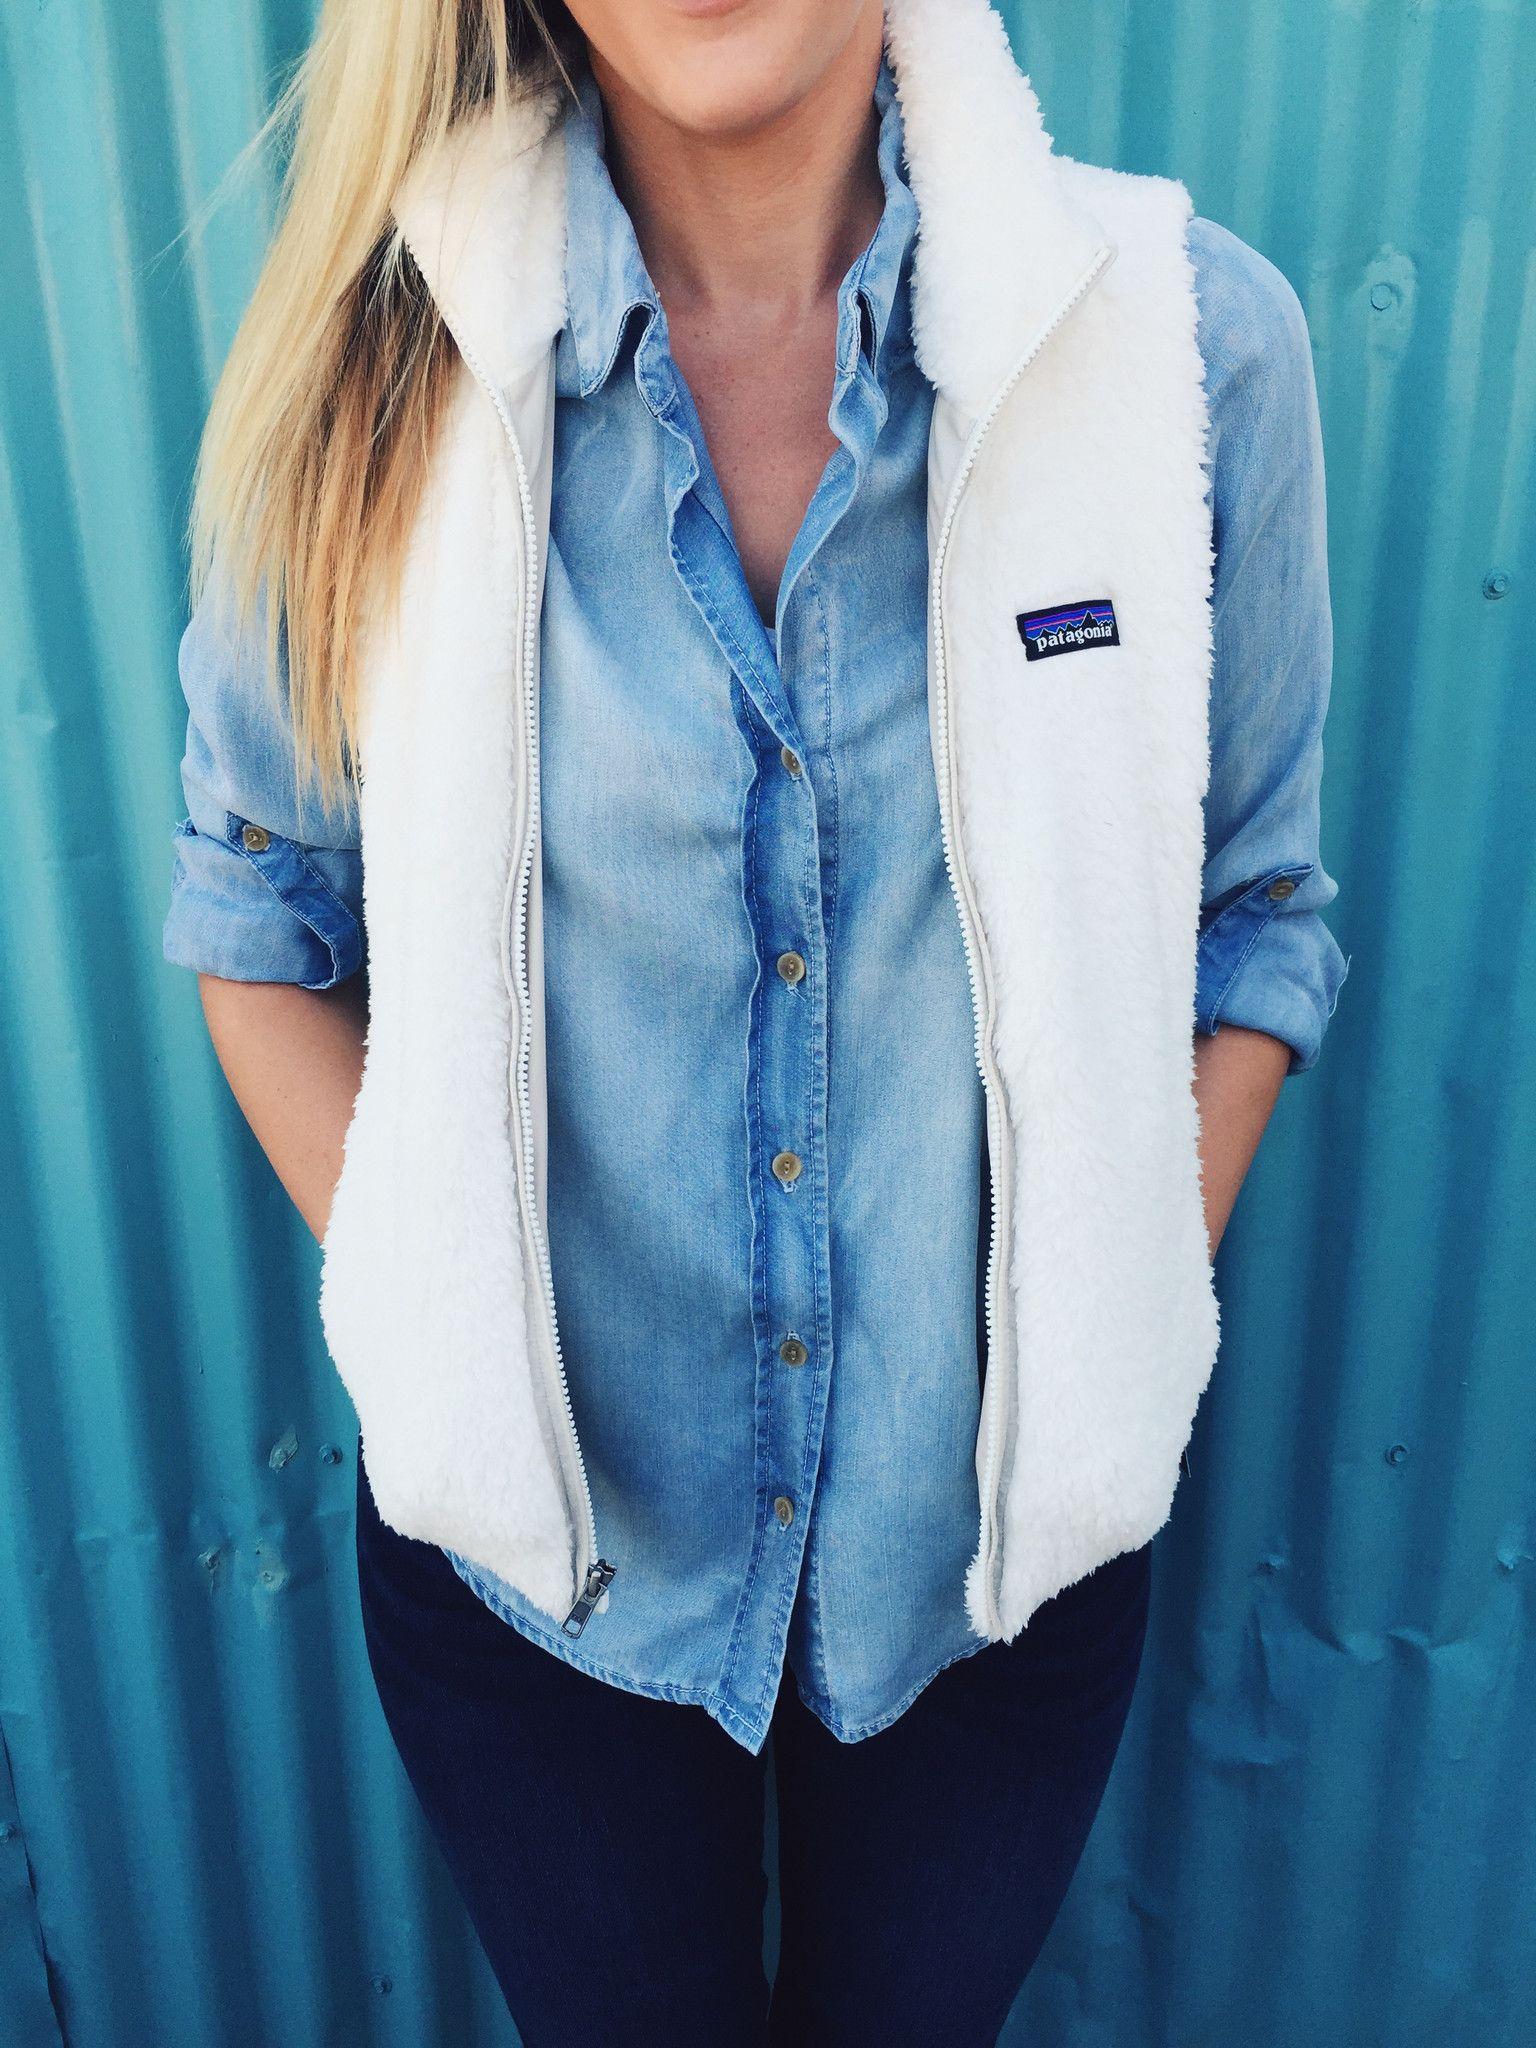 dffc0e7b Patagonia Women's Los Gatos Vest- White | Clothes | Fashion, Outfits ...